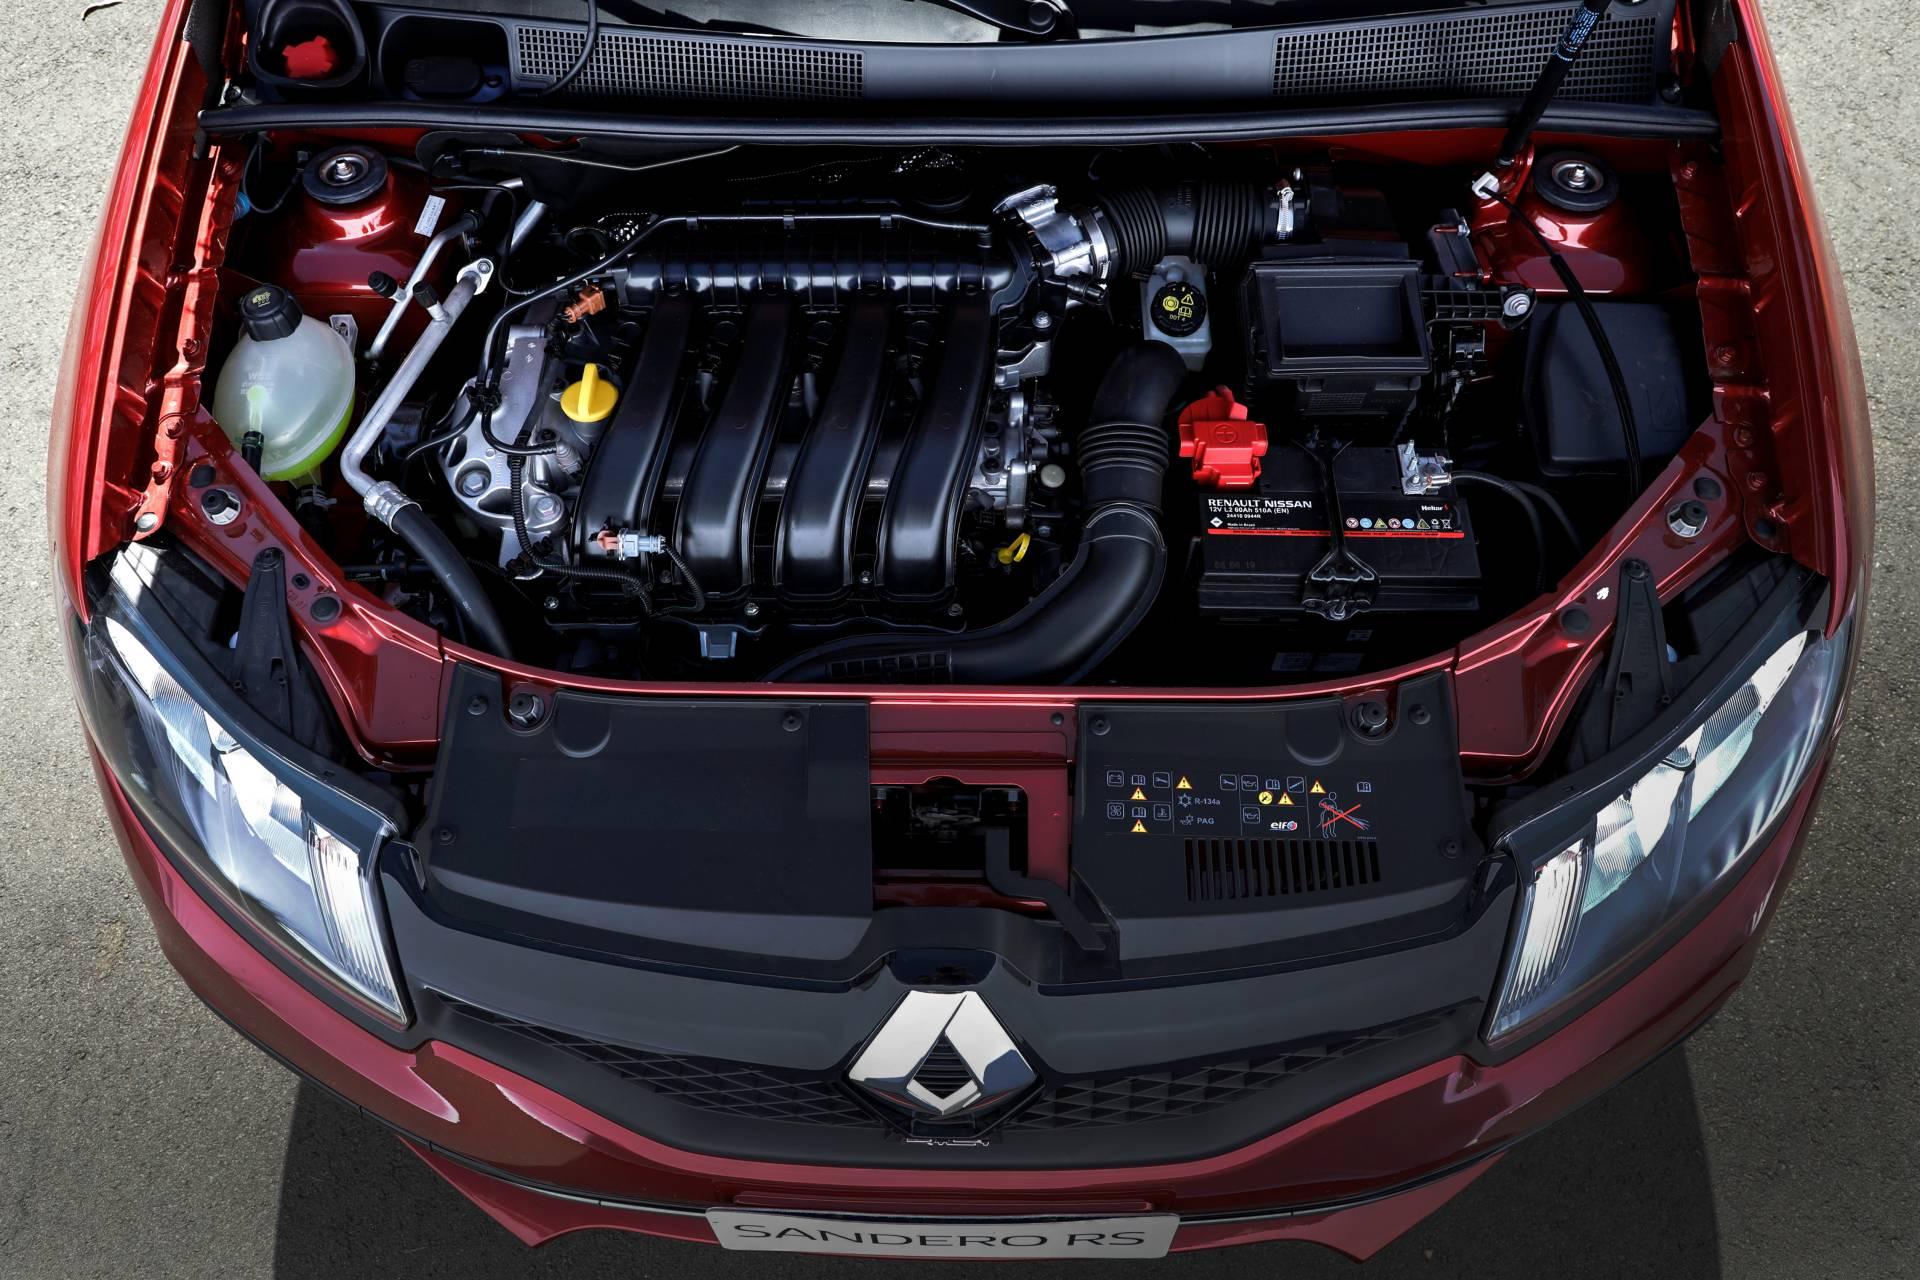 2020_Renault_Sandero_RS_facelift_0027